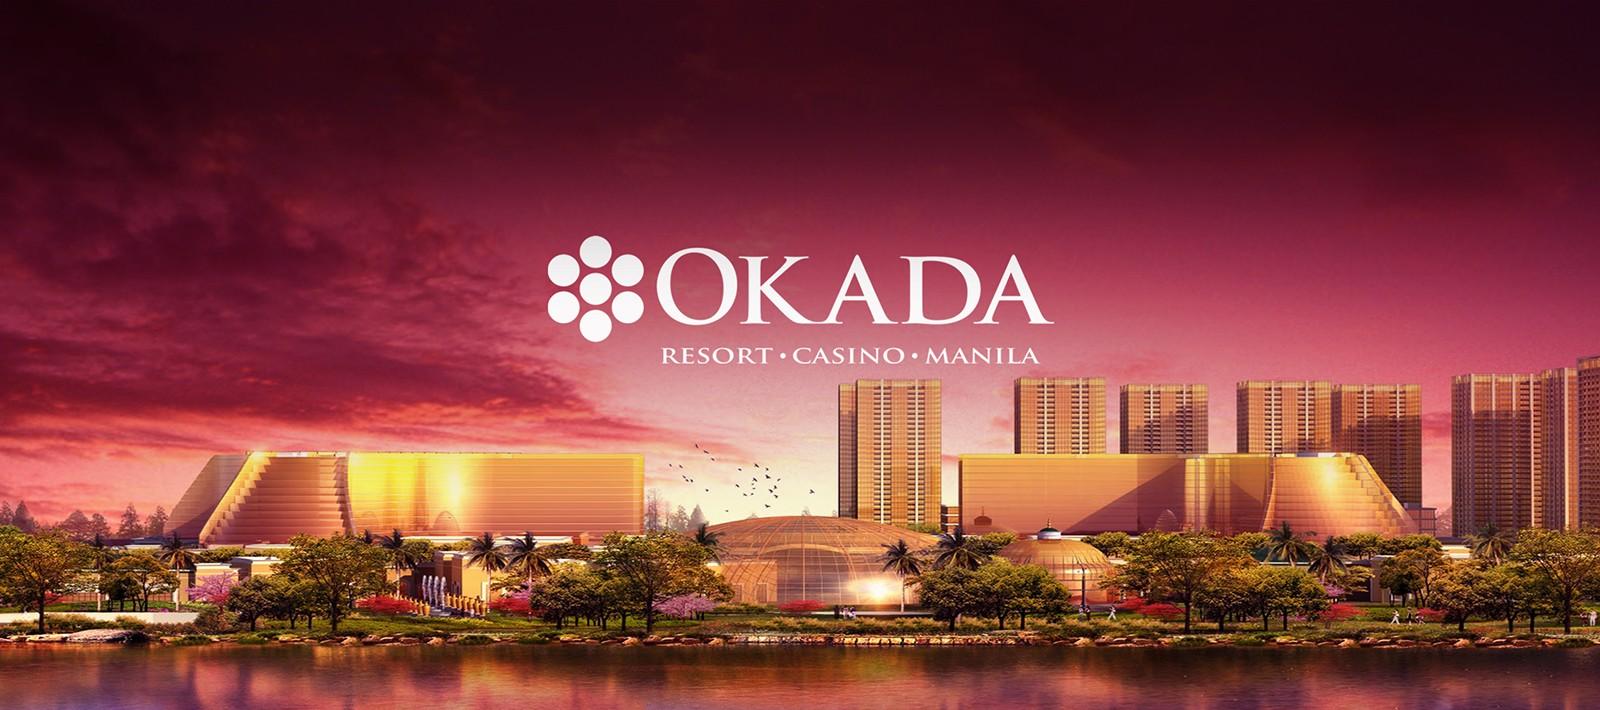 Okada-property-destination-branding-2